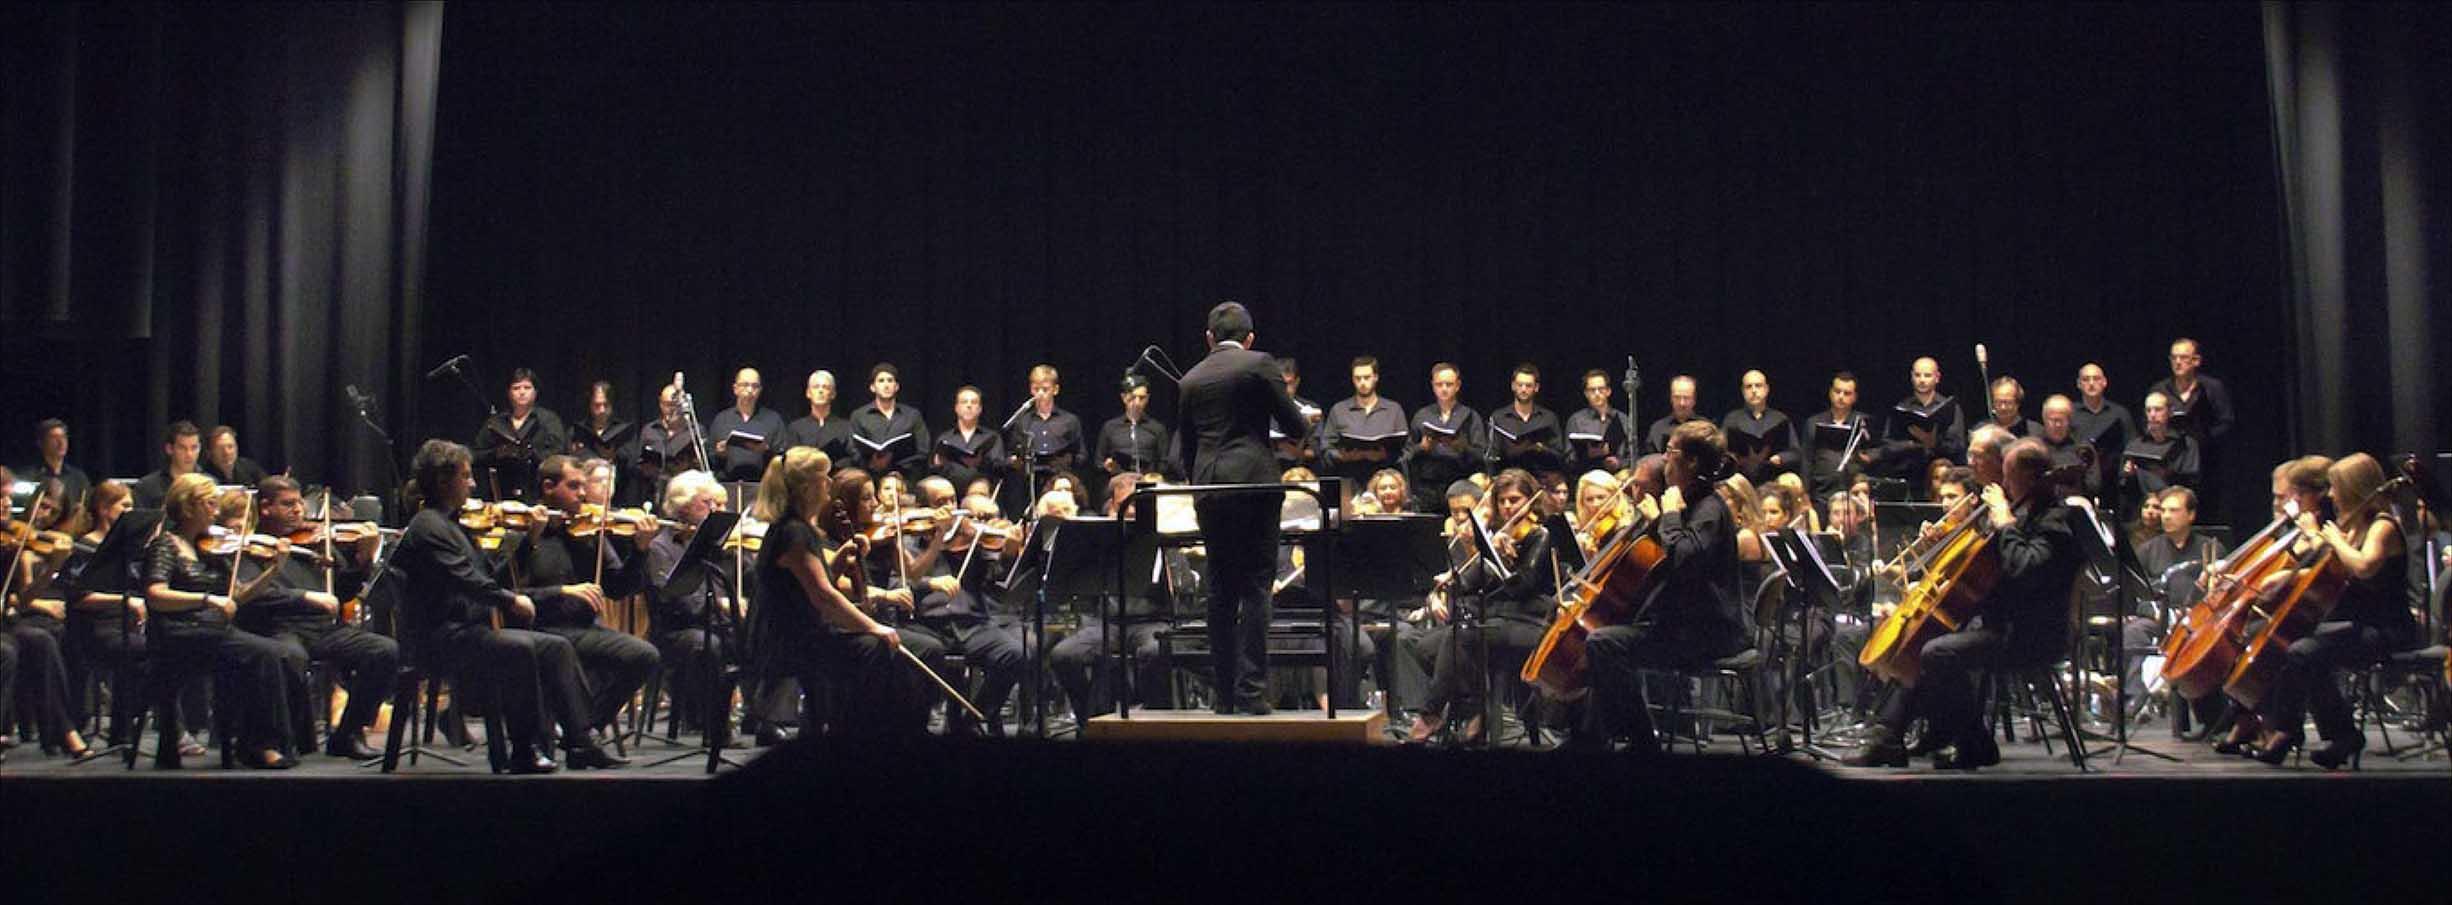 jose_maria-gallardo_del_rey-next-event-banner-2452×905-orquesta-filarmonica-malaga